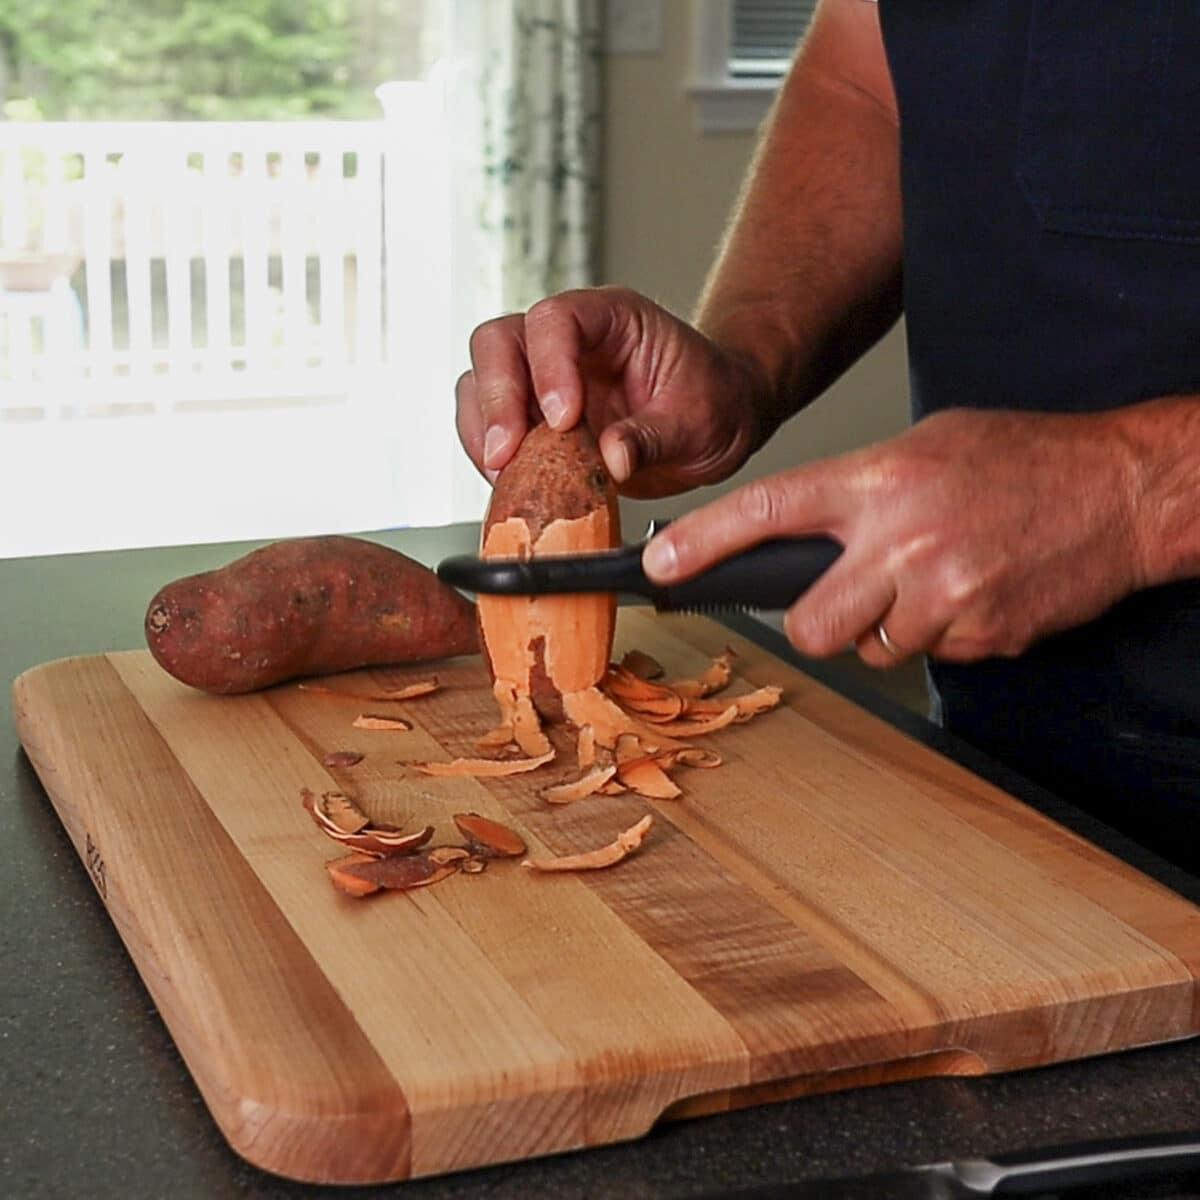 peeling a potato with a peeler